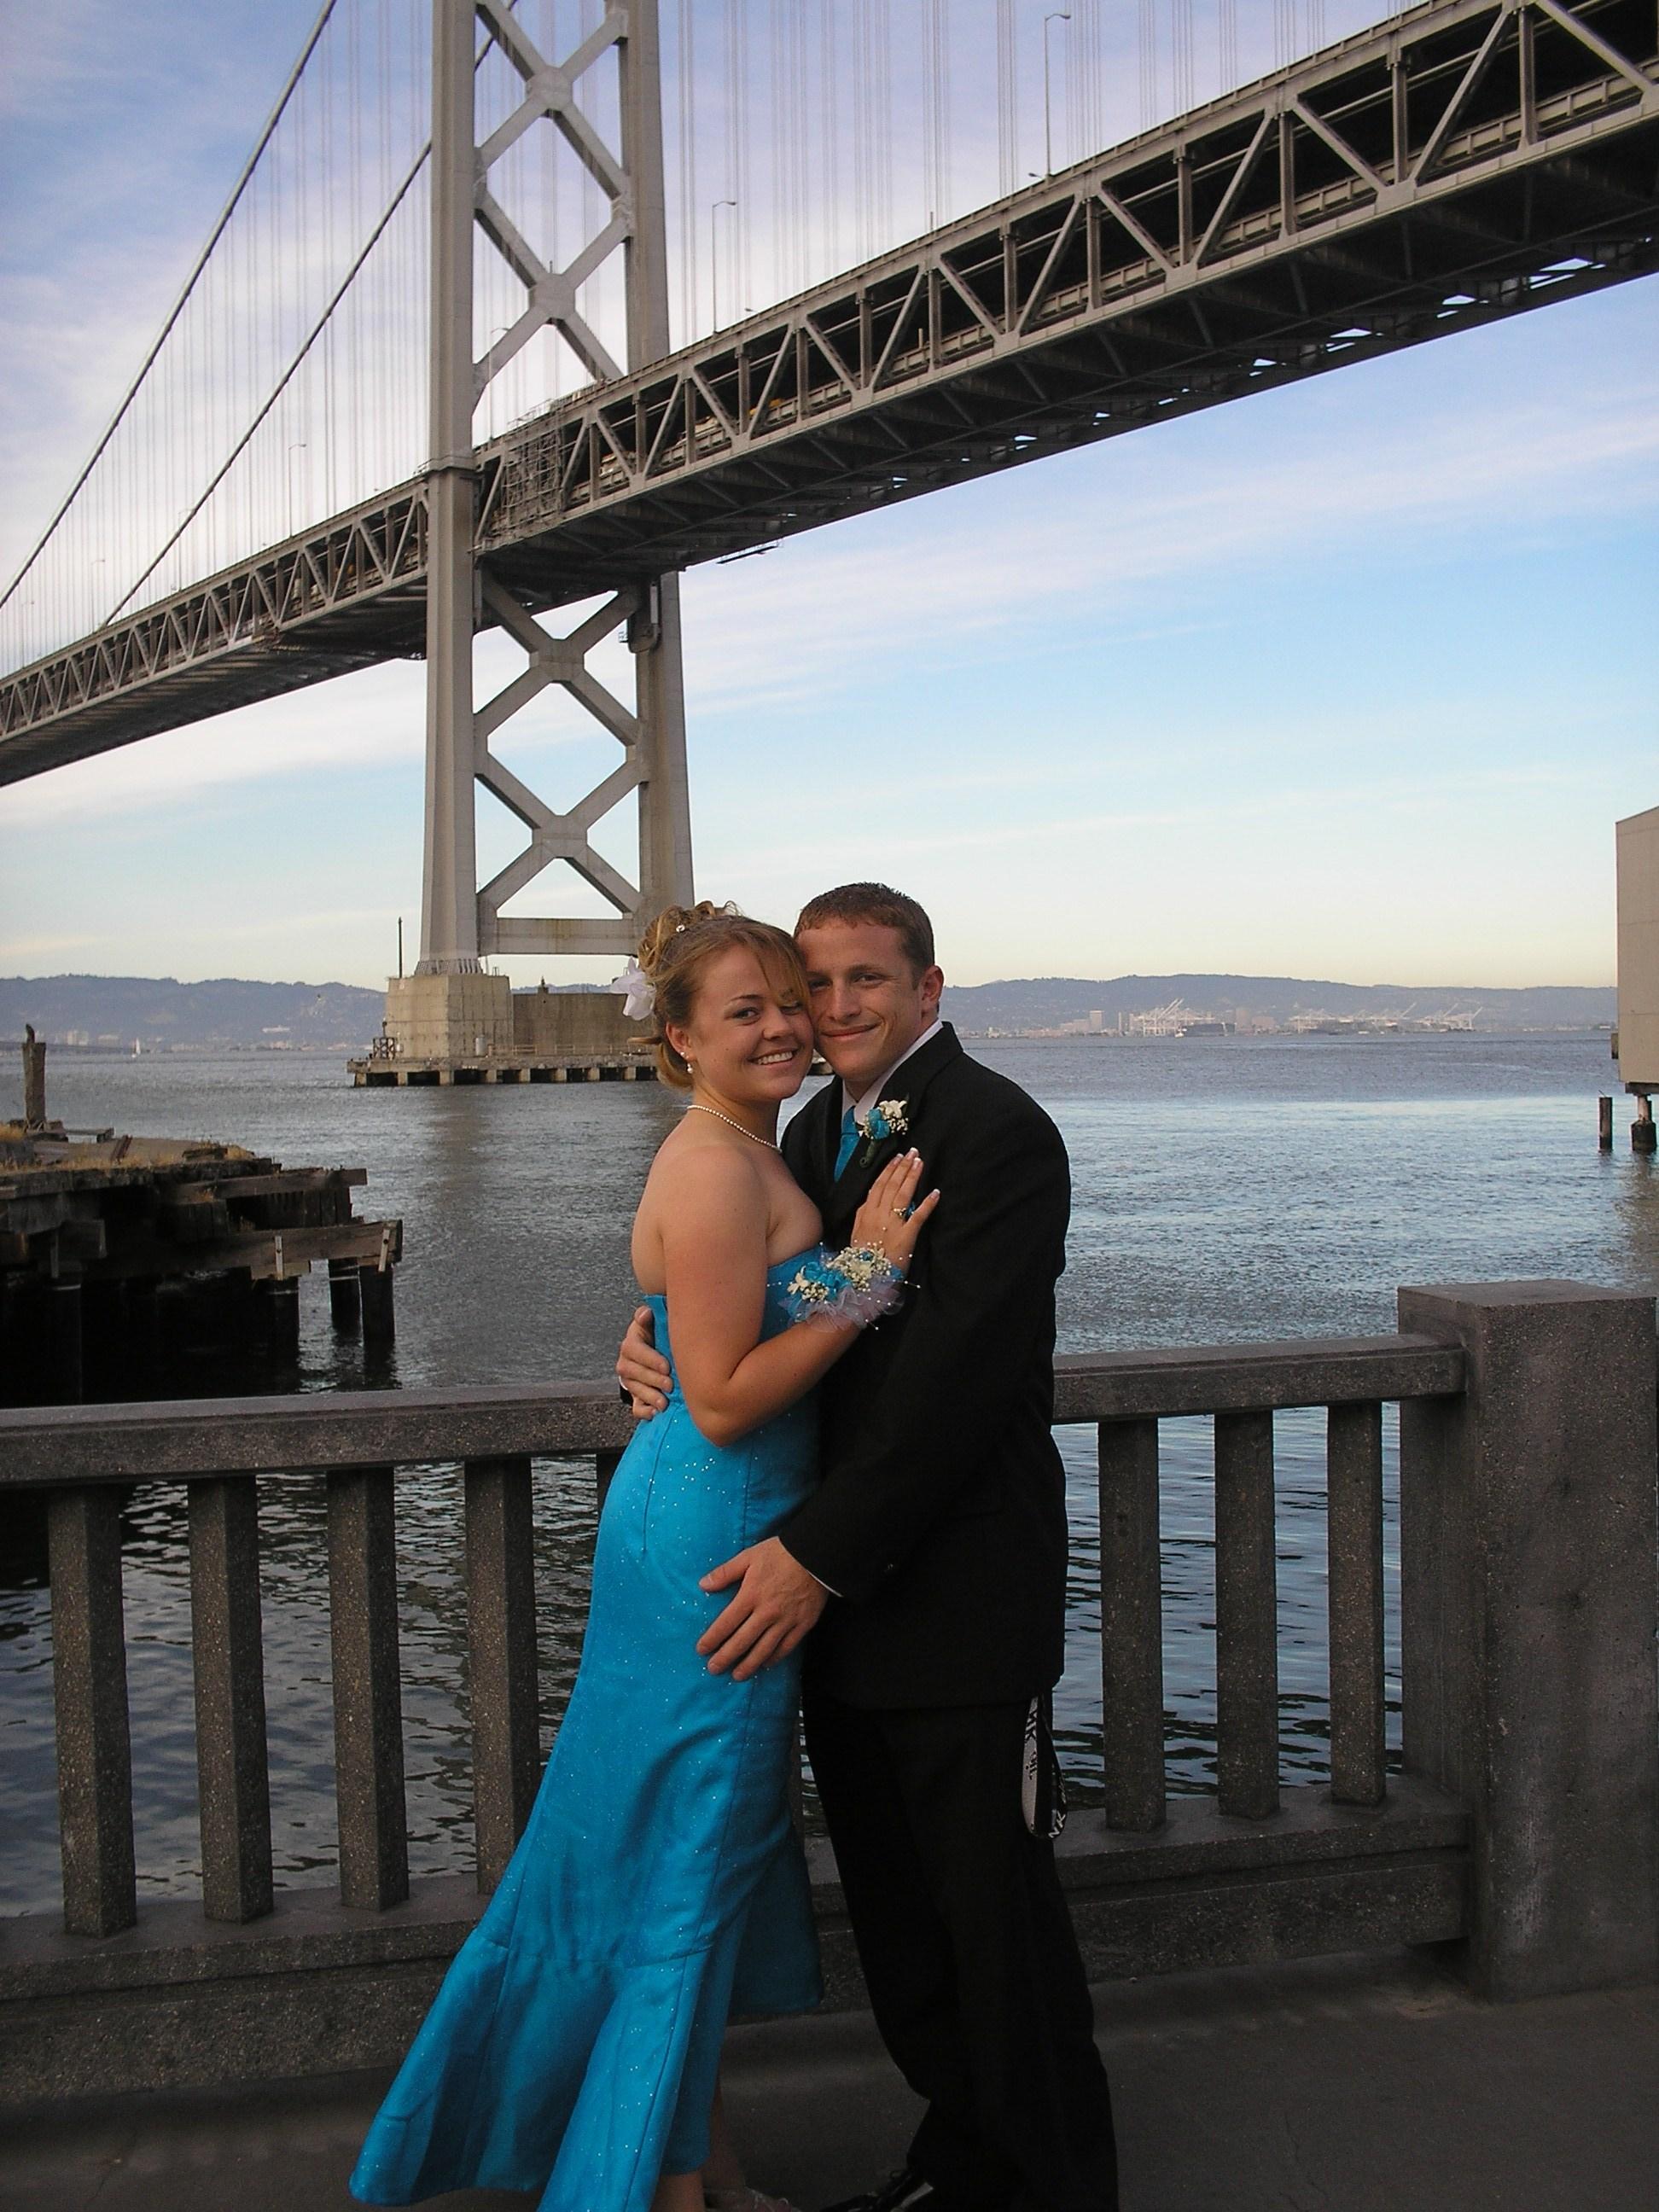 The Bay Wedding Gift Registry Search Presta Wedding Blogs